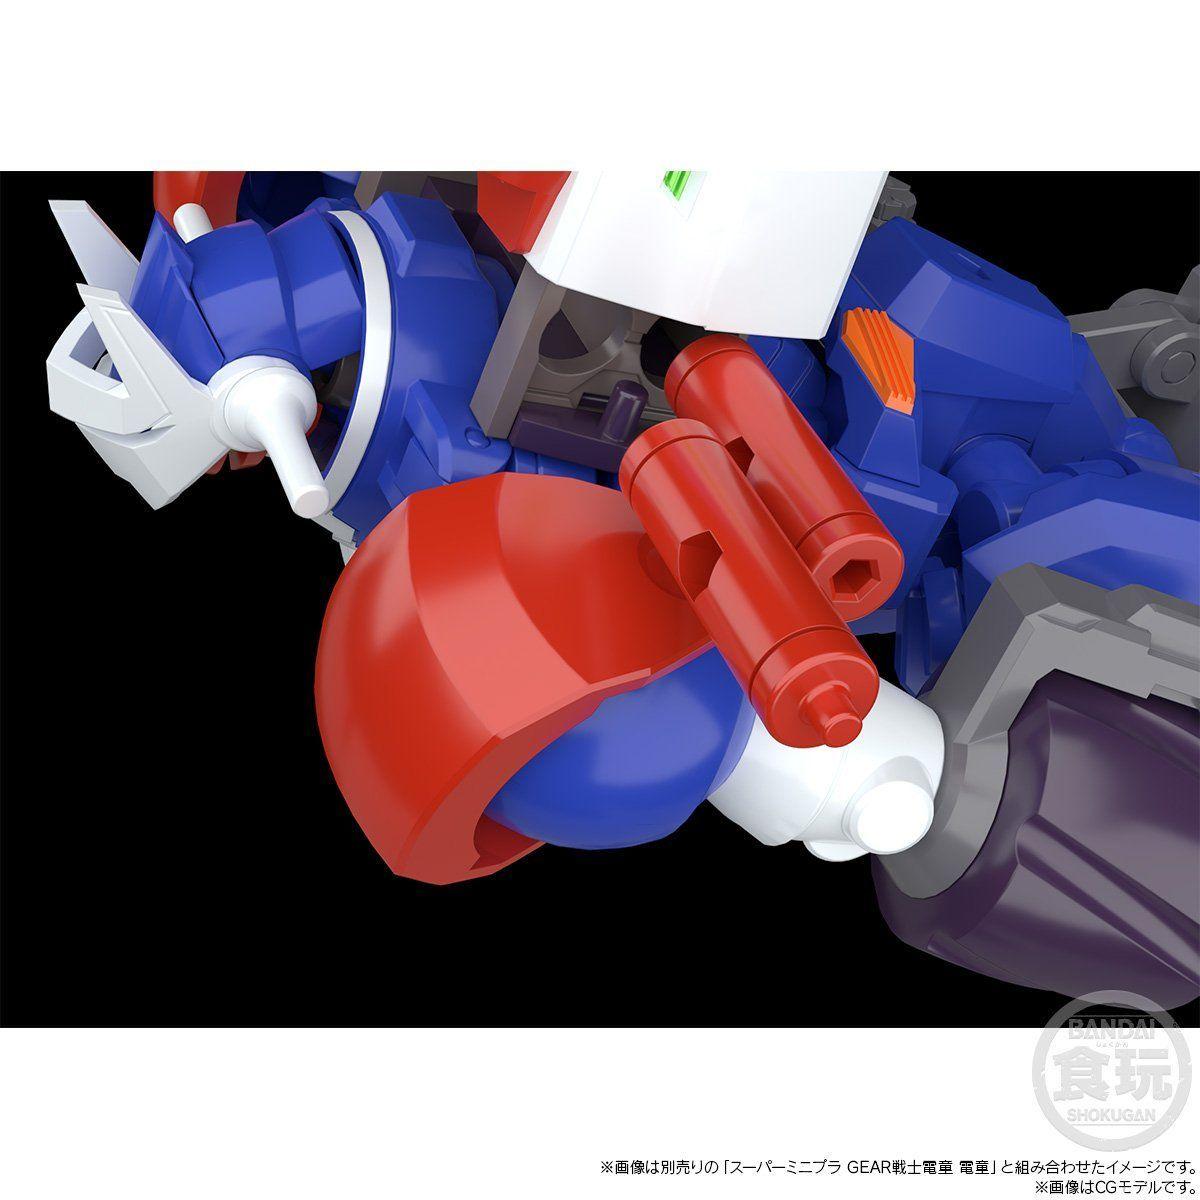 SMP [SHOKUGAN MODELING PROJECT] GEAR戦士電童 セルファイター/セルブースター&セルブースター・バルハラセット【PB限定】_5